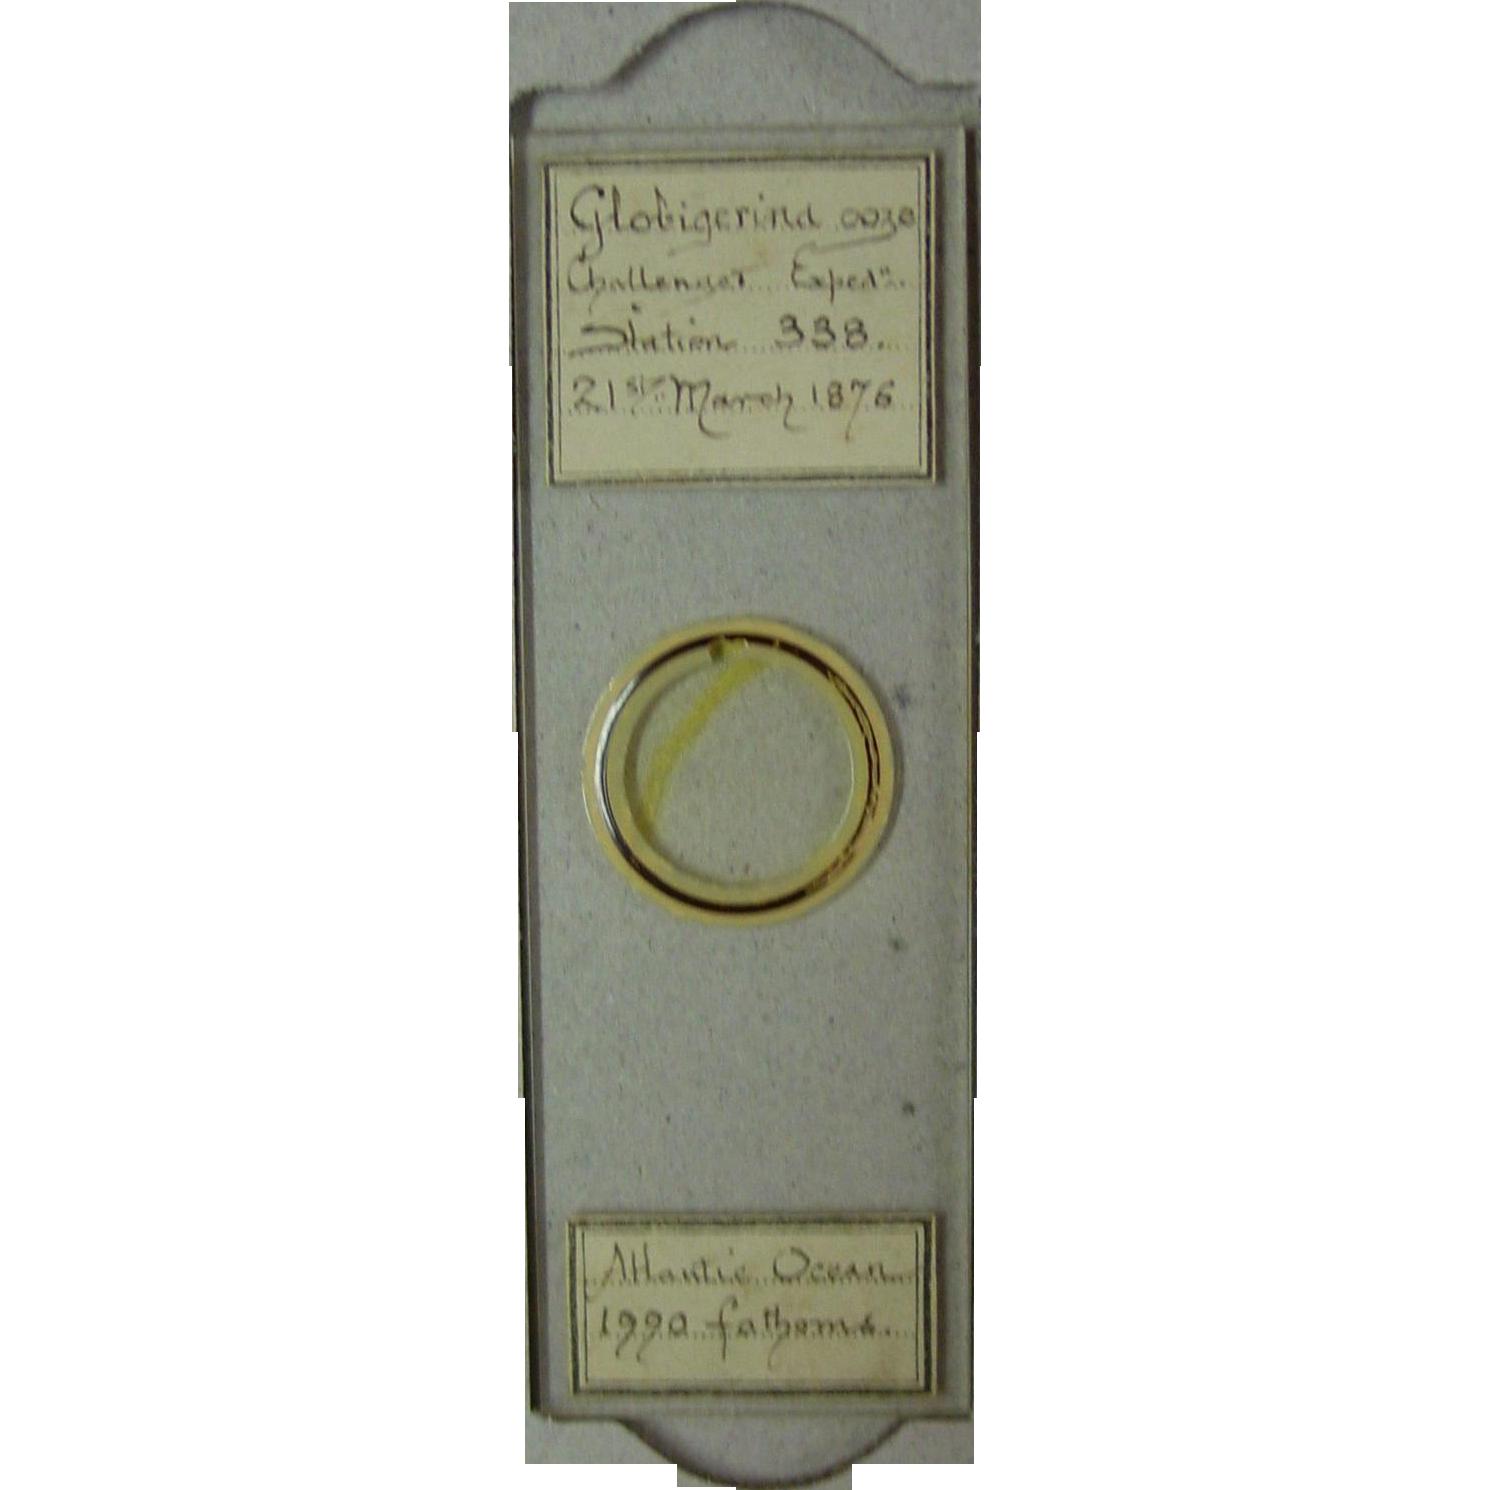 Desirable 1876 HMS Challenger scientific microscopic slide